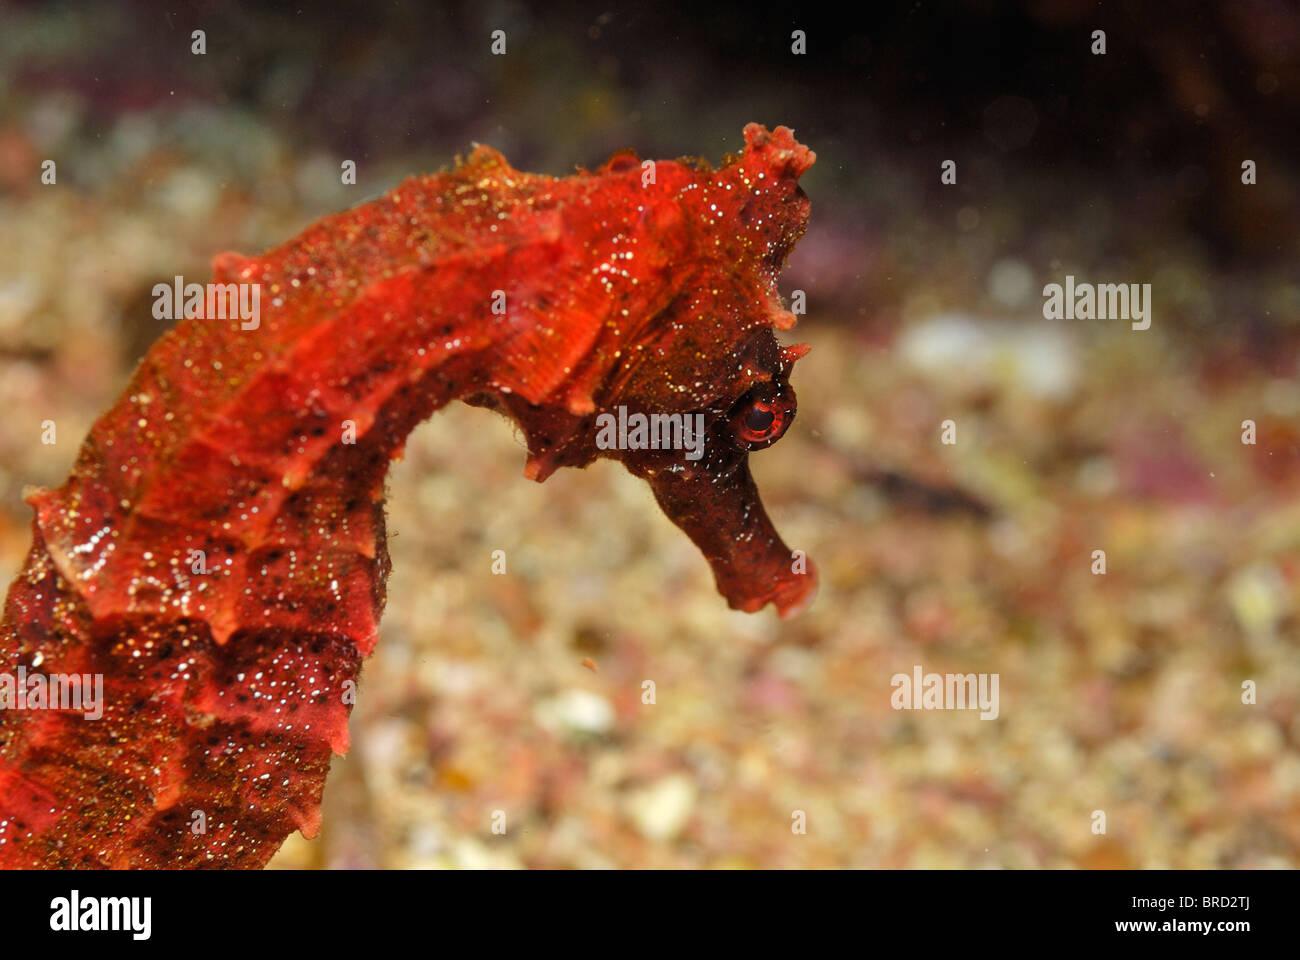 Close up rosso cavalluccio marino del Pacifico (Hippocampus ingens), vista subacquea, off le isole Galapagos arcipelago, Immagini Stock